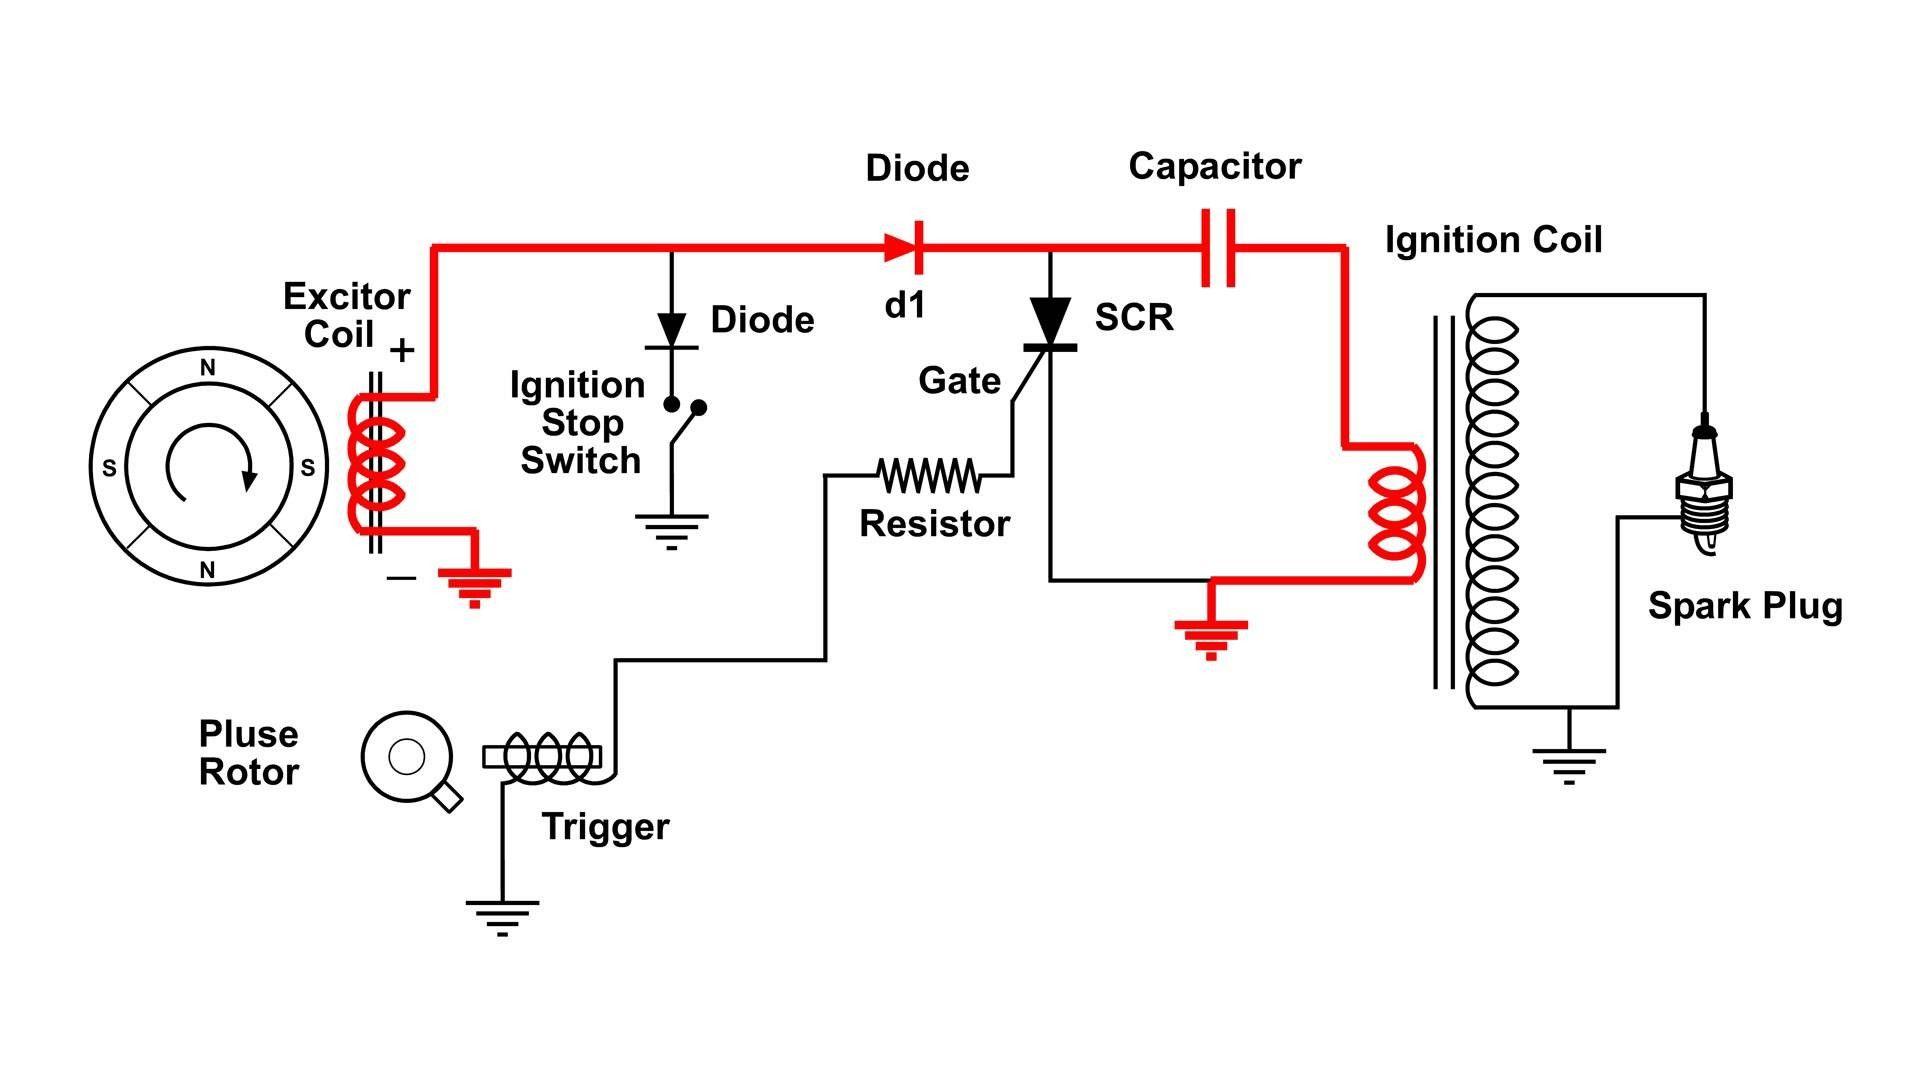 medium resolution of magneto cdi wiring diagram wiring diagram name magneto cdi wiring diagram